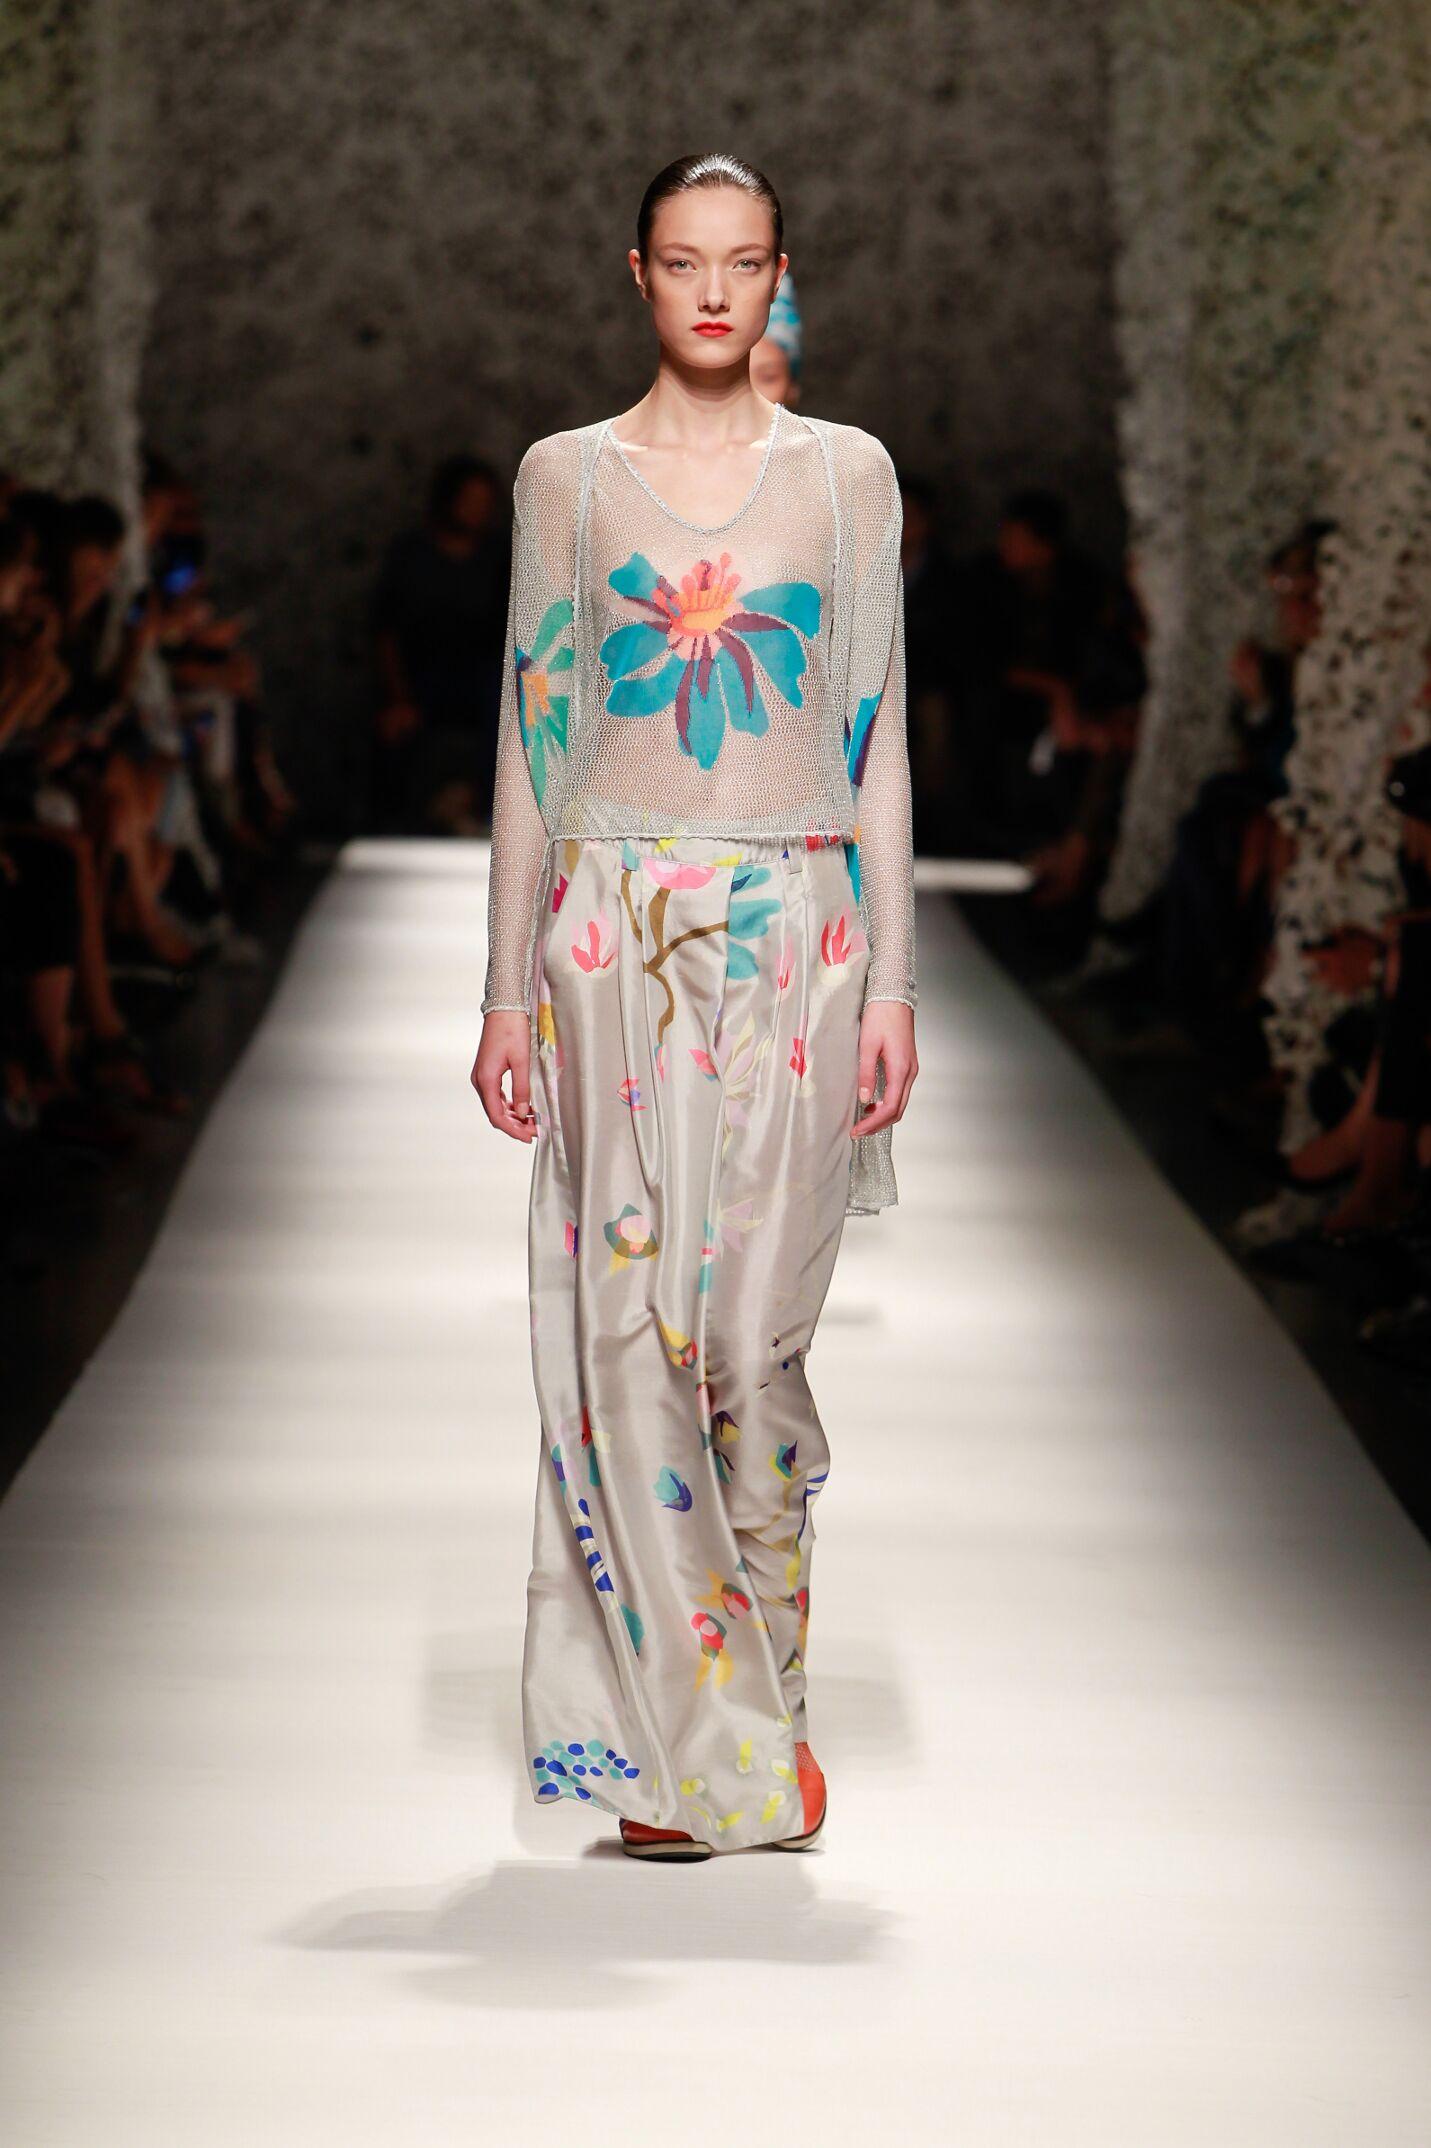 Missoni Summer 2015 Catwalk Womenswear